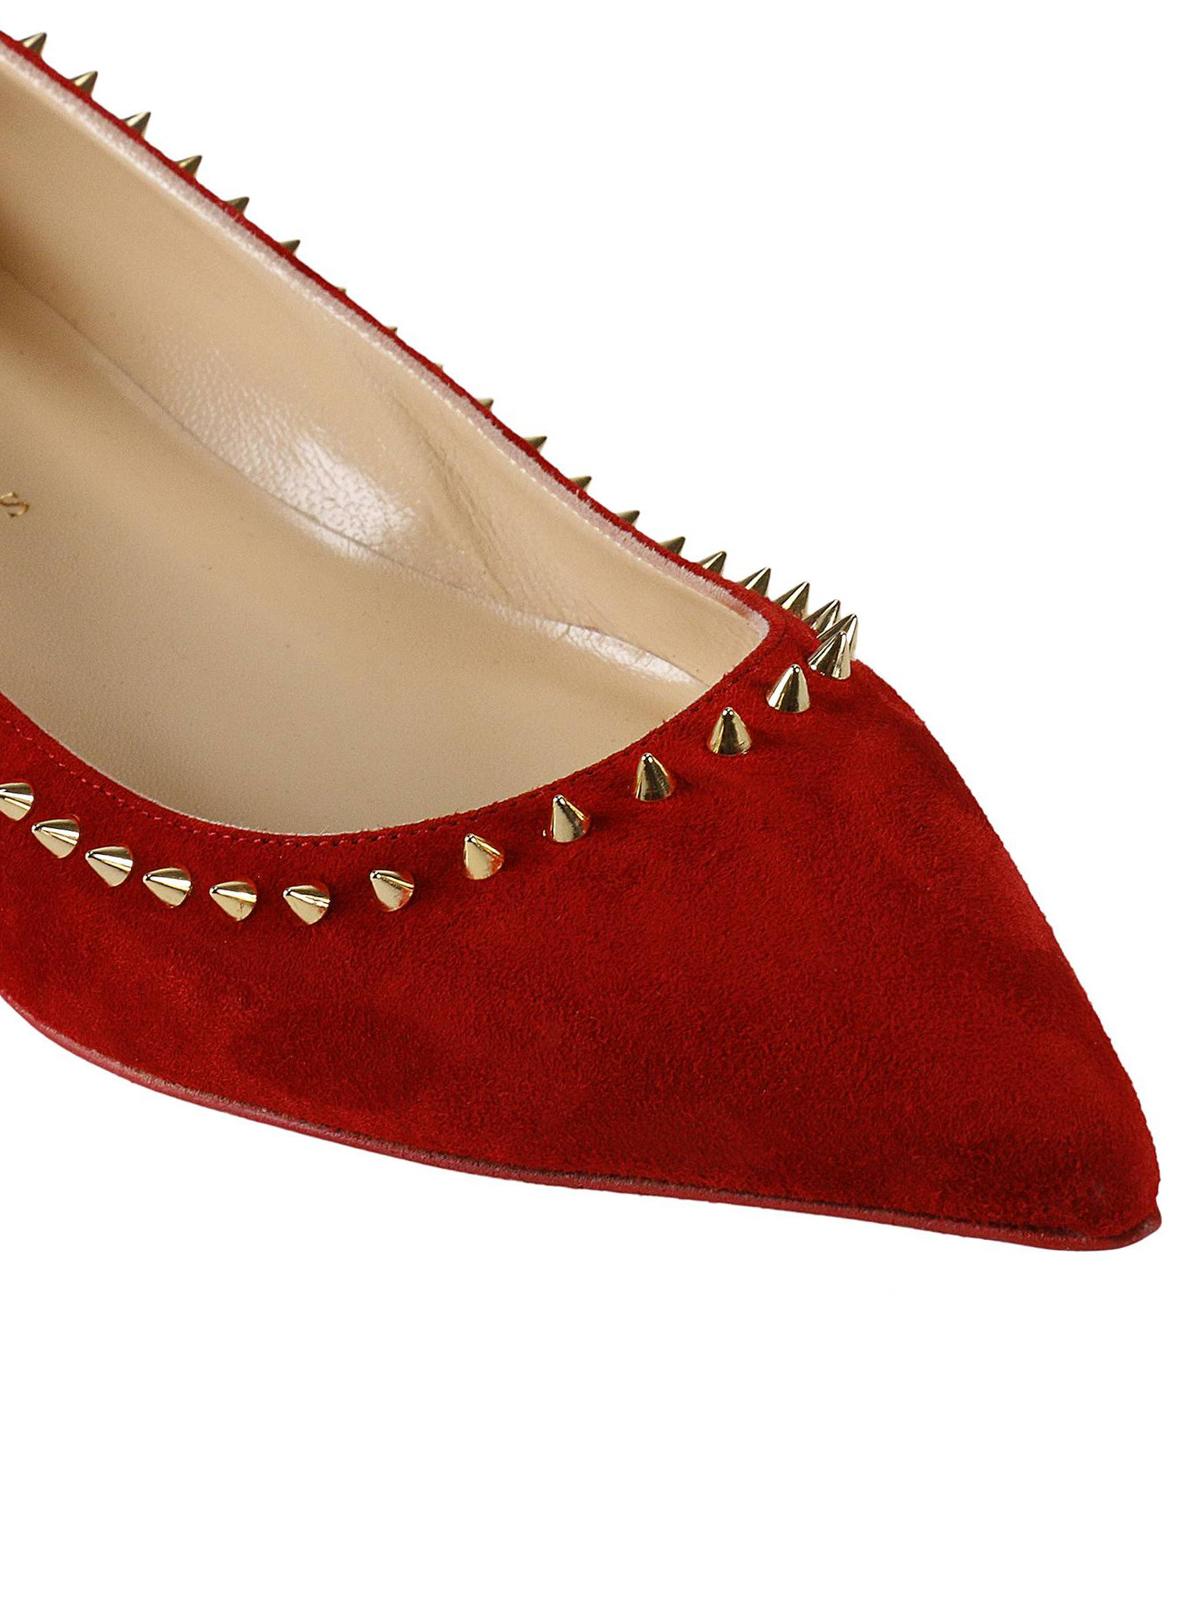 795b4cf1aab9 iKRIX CHRISTIAN LOUBOUTIN  flat shoes - Anjalina spike trim red suede flats